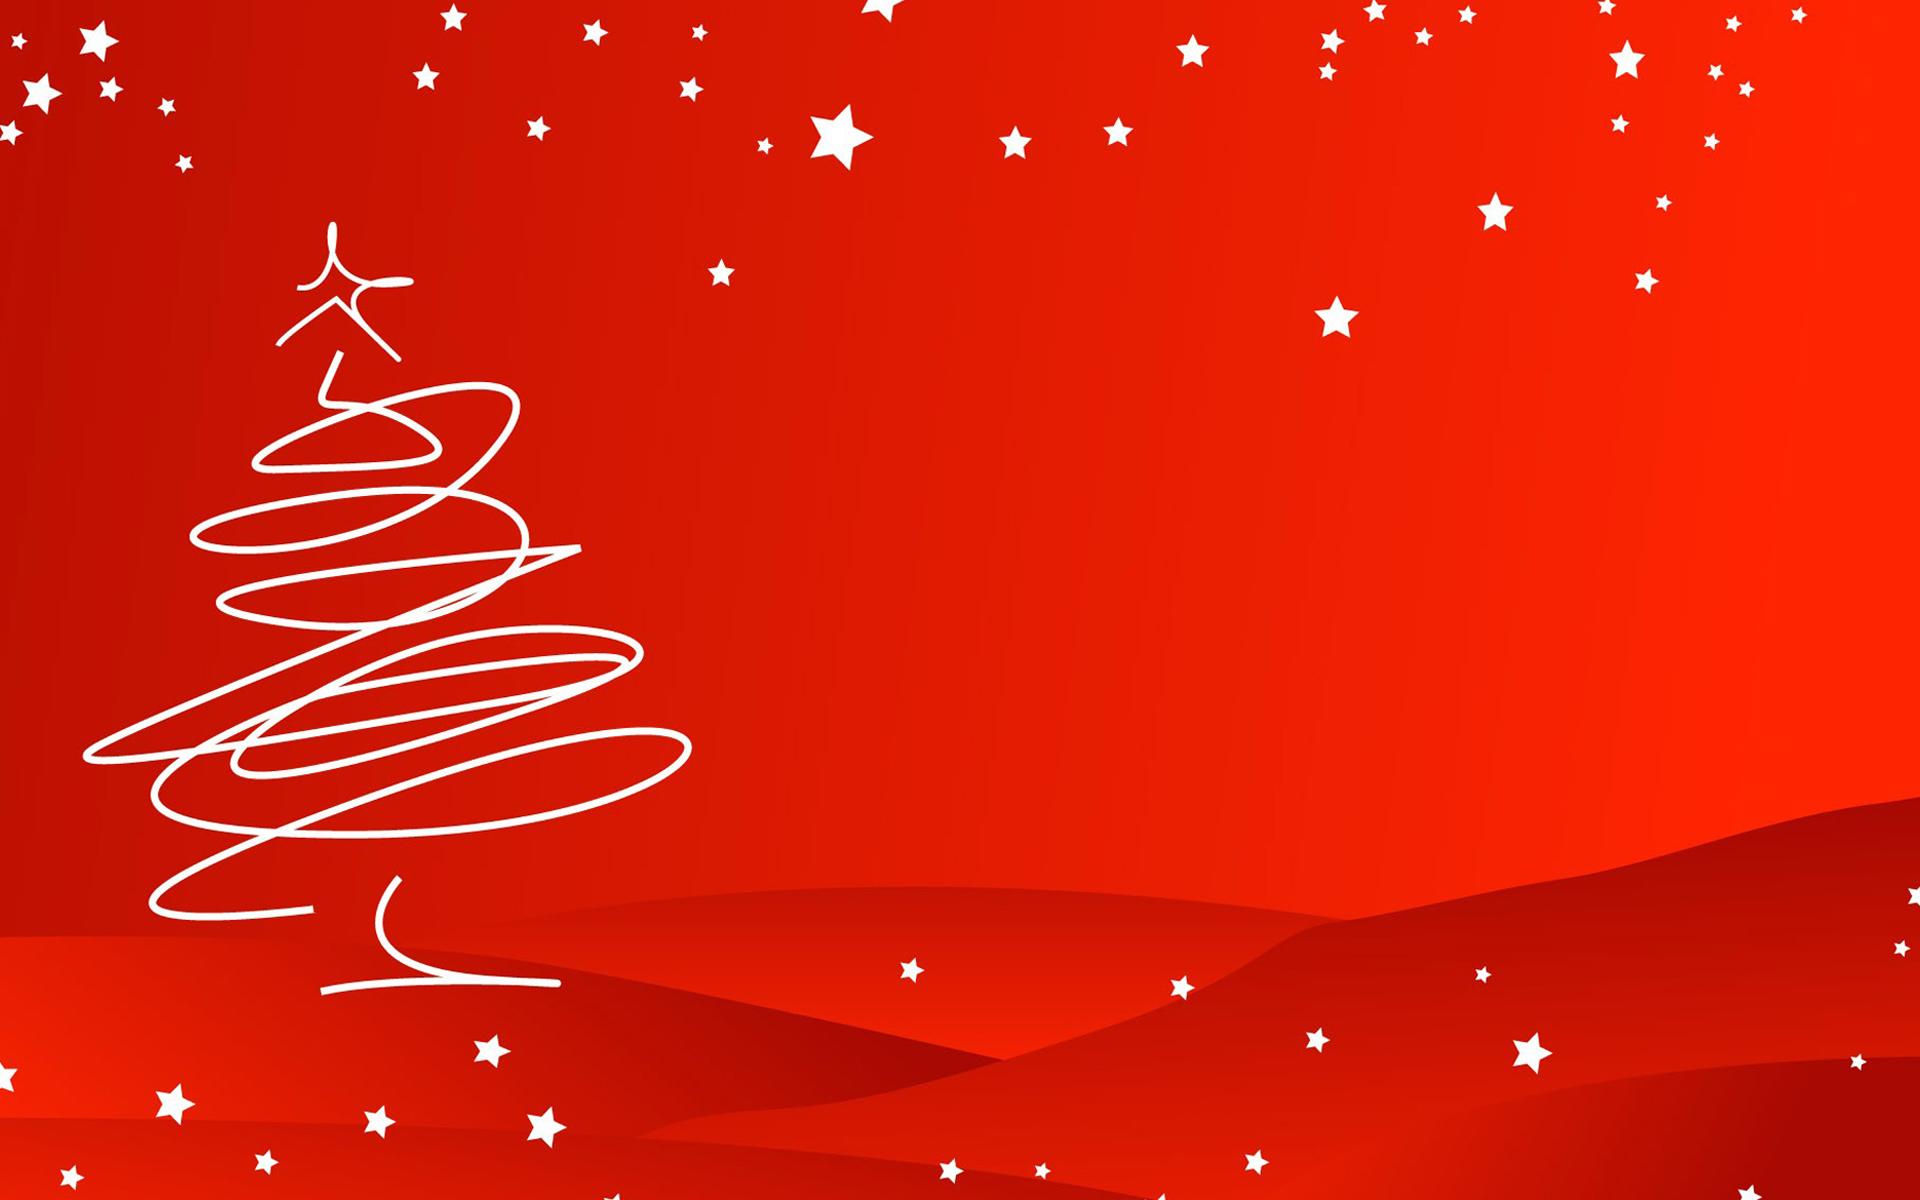 landscape christmas backgrounds for christmas